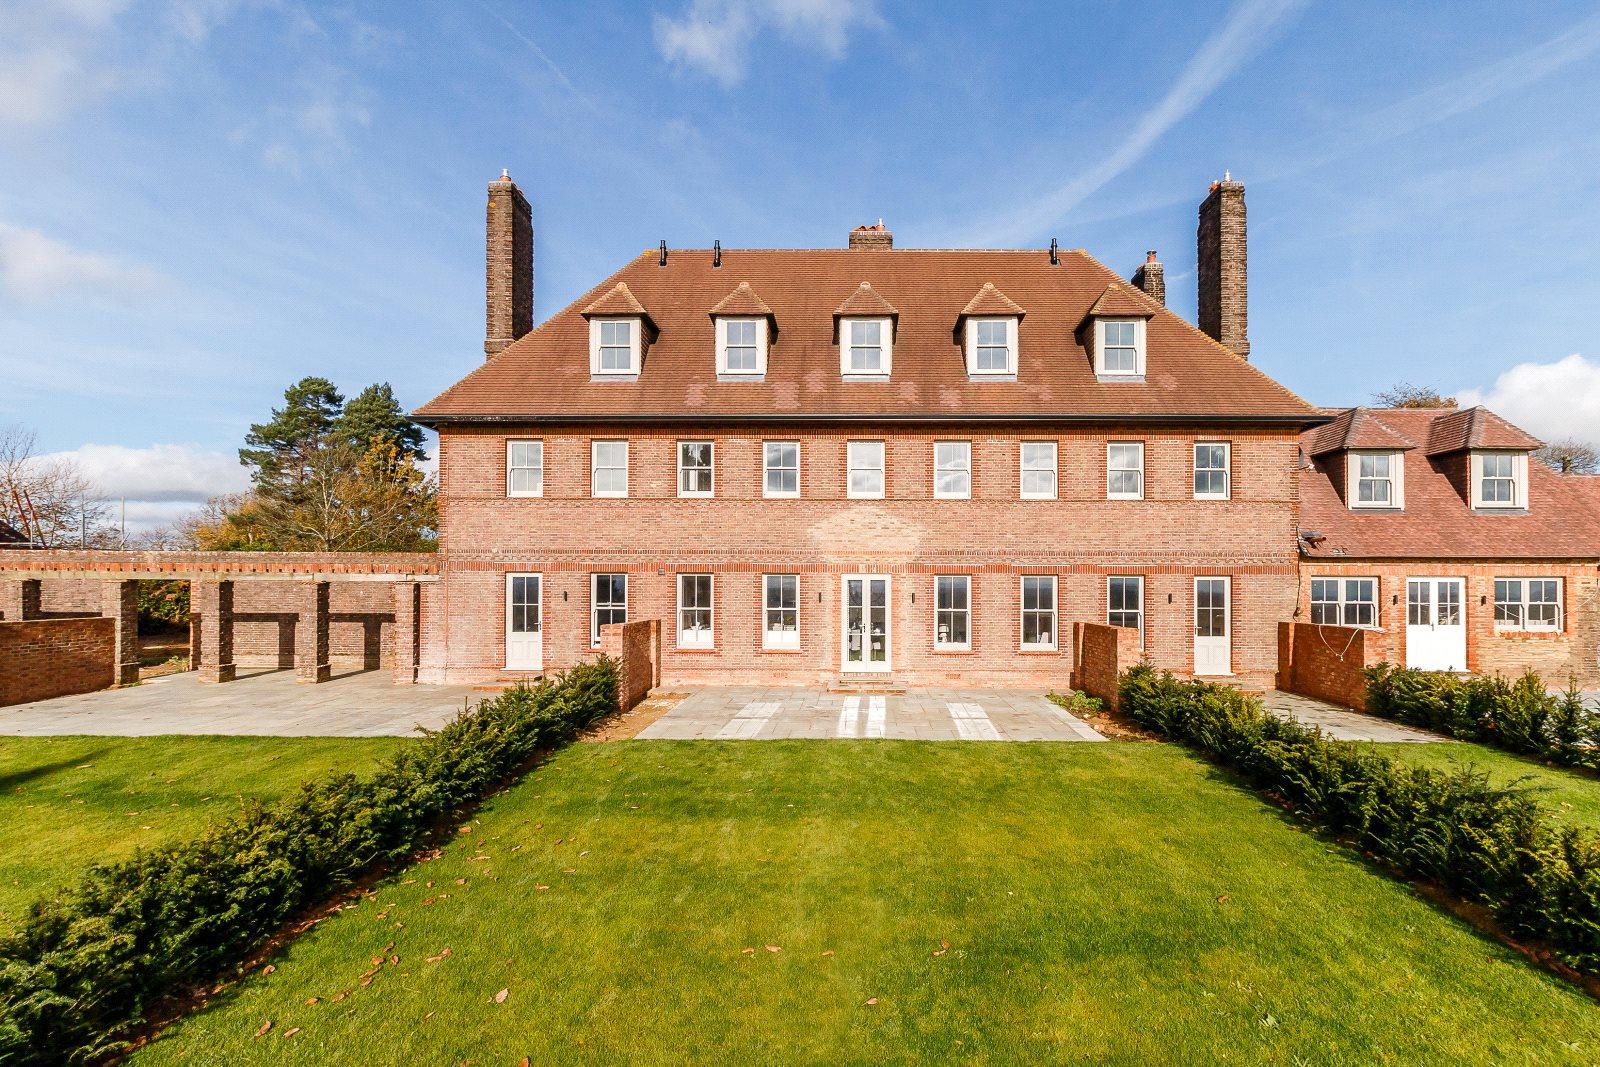 Maison unifamiliale pour l Vente à Gorse Hill, Petworth Road, Wormley, Godalming, GU8 Godalming, Angleterre